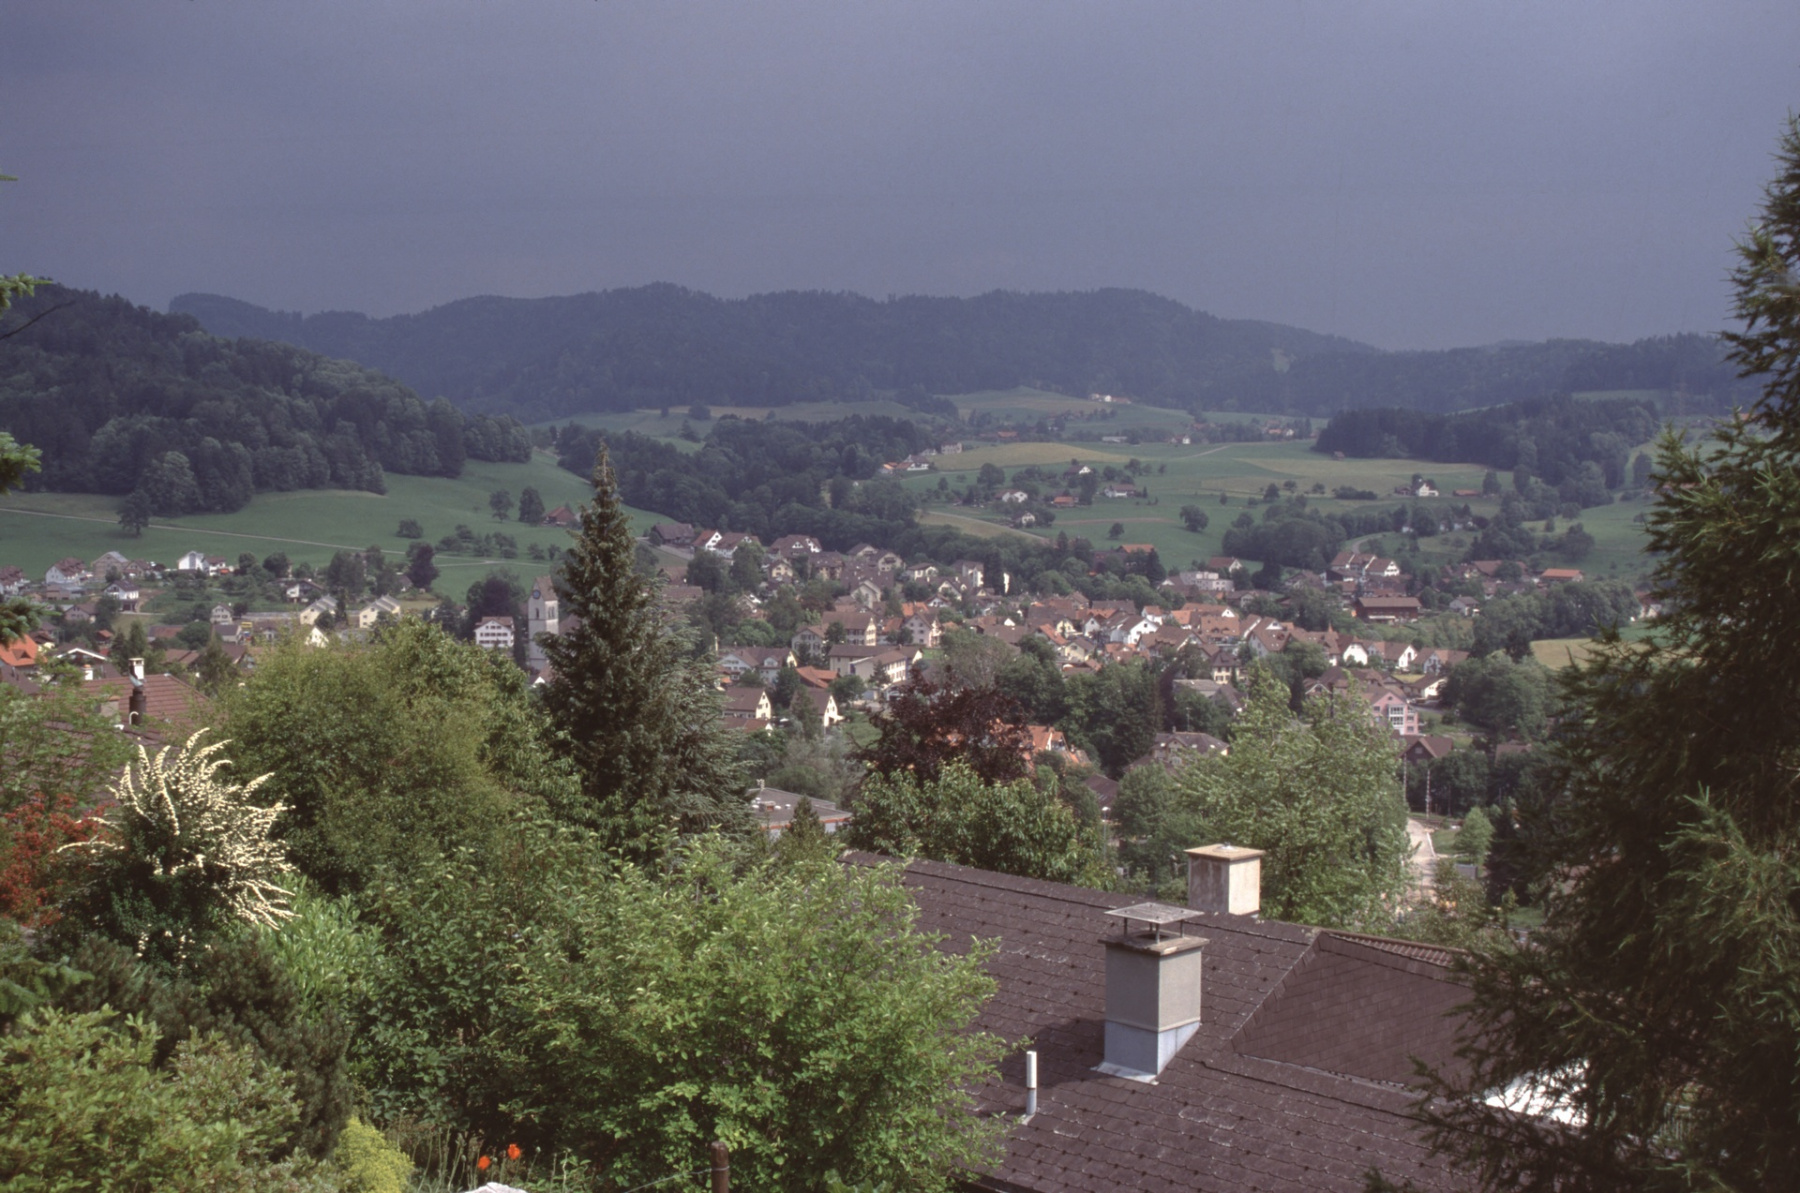 Blick auf das Dorf (Tödistr 35)